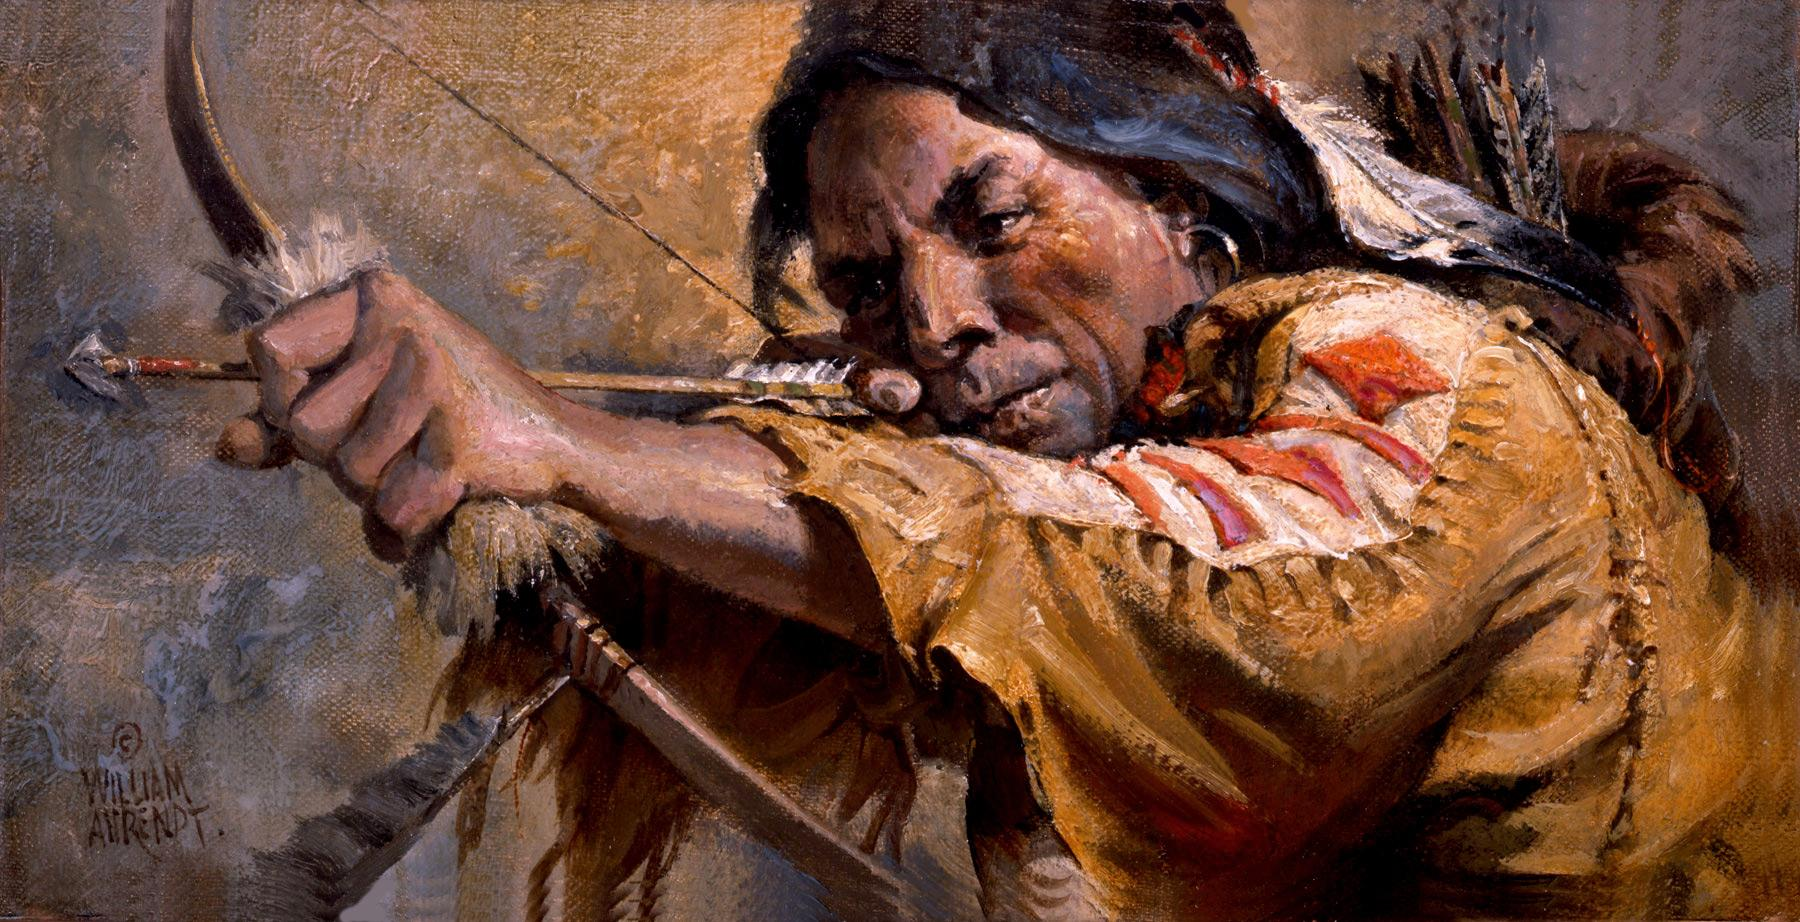 Native american wallpapers wallpapersafari 1800x922 pics photos wallpaper native american wallpaper native voltagebd Choice Image